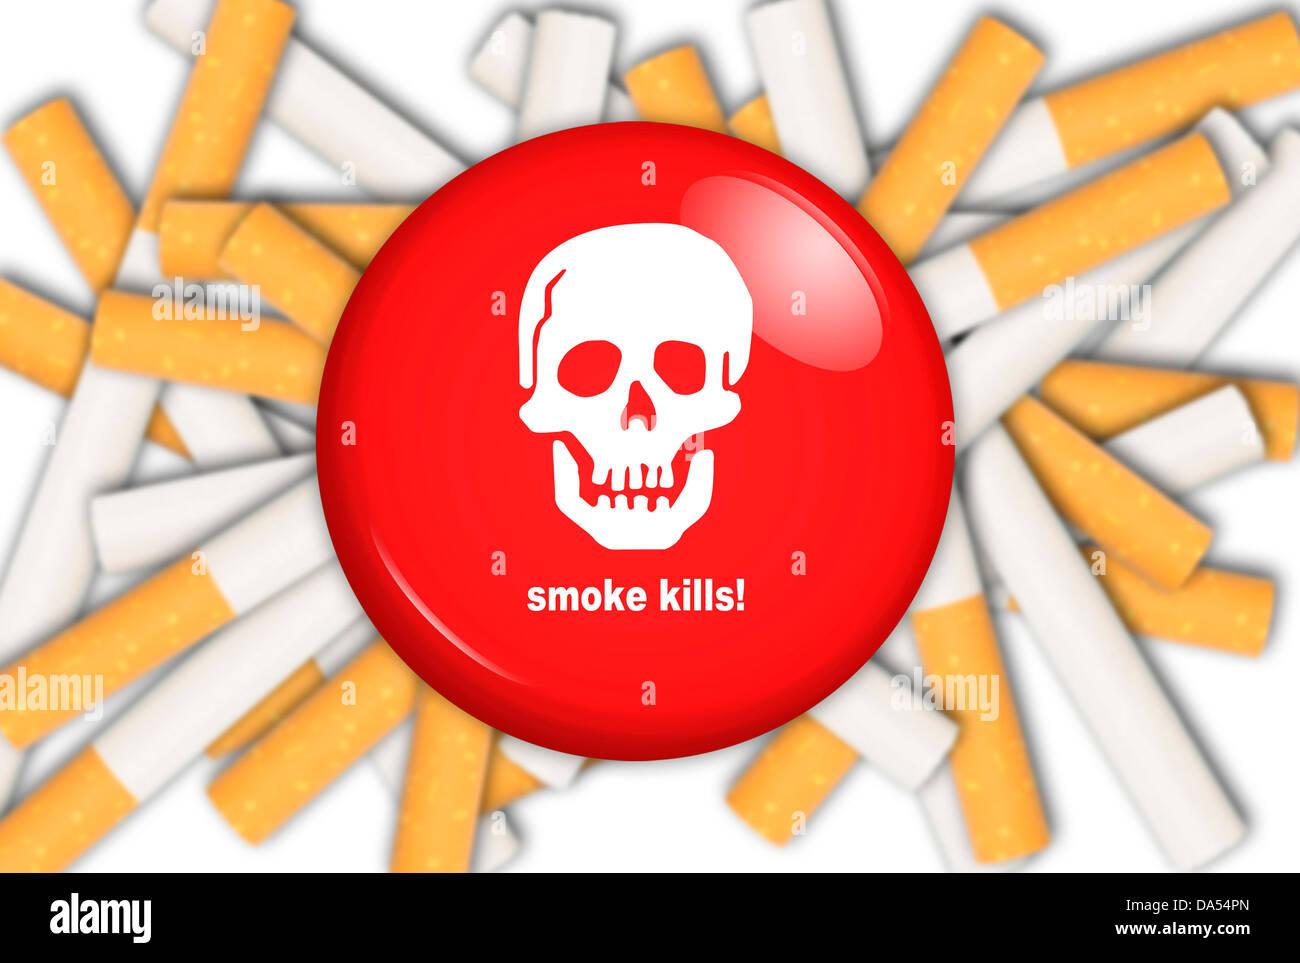 Fumar mata el concepto Imagen De Stock